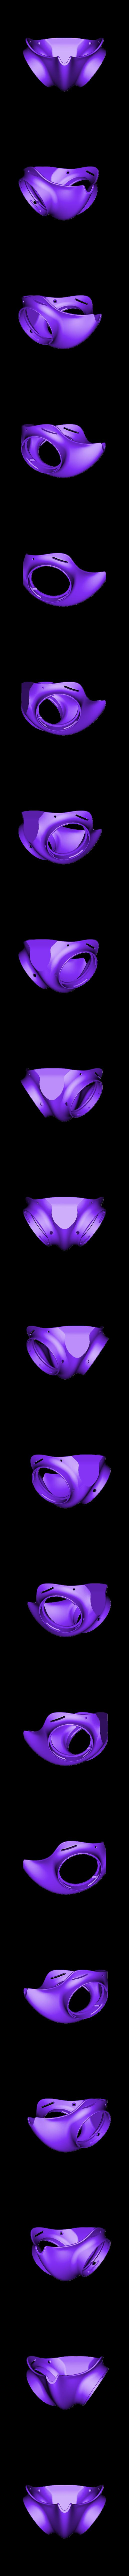 MASK_Respiro.stl Download free STL file #3DvsCOVID19 Mask with Fans for Air I/O. • 3D printer design, alonsothander